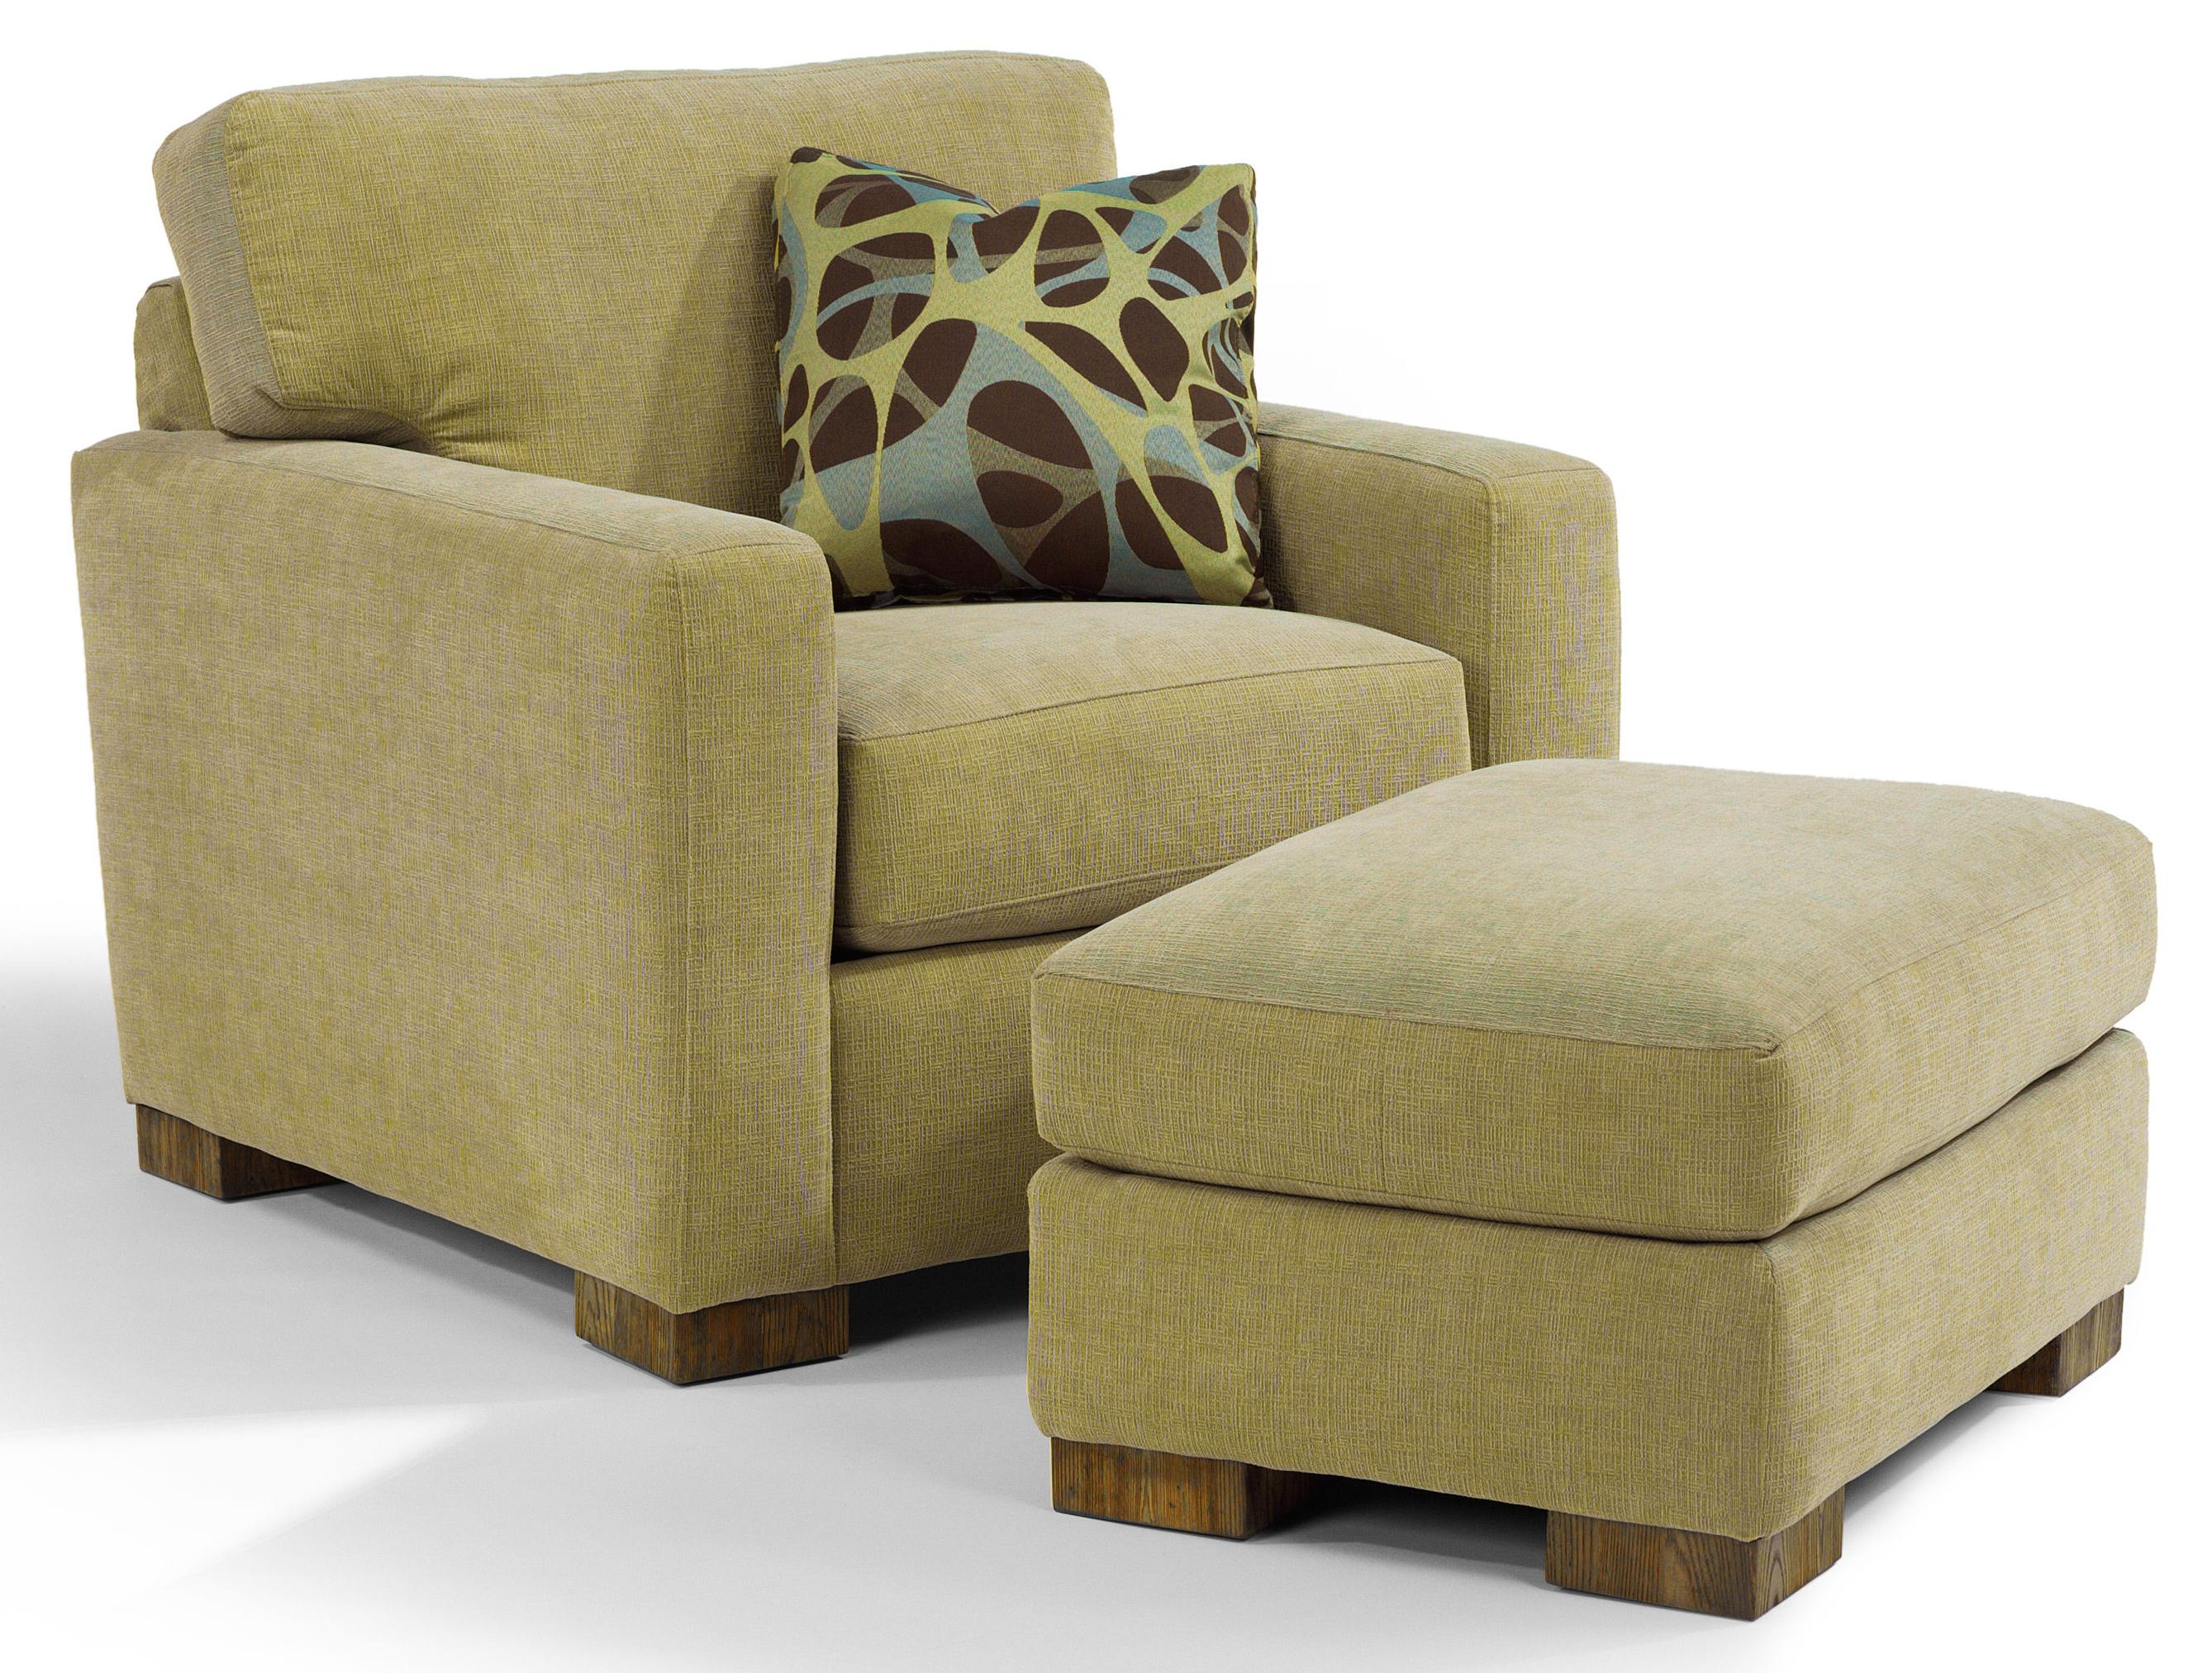 Flexsteel Bryant 7399 08 Contemporary Ottoman With Block Wood Feet John V Schultz Furniture